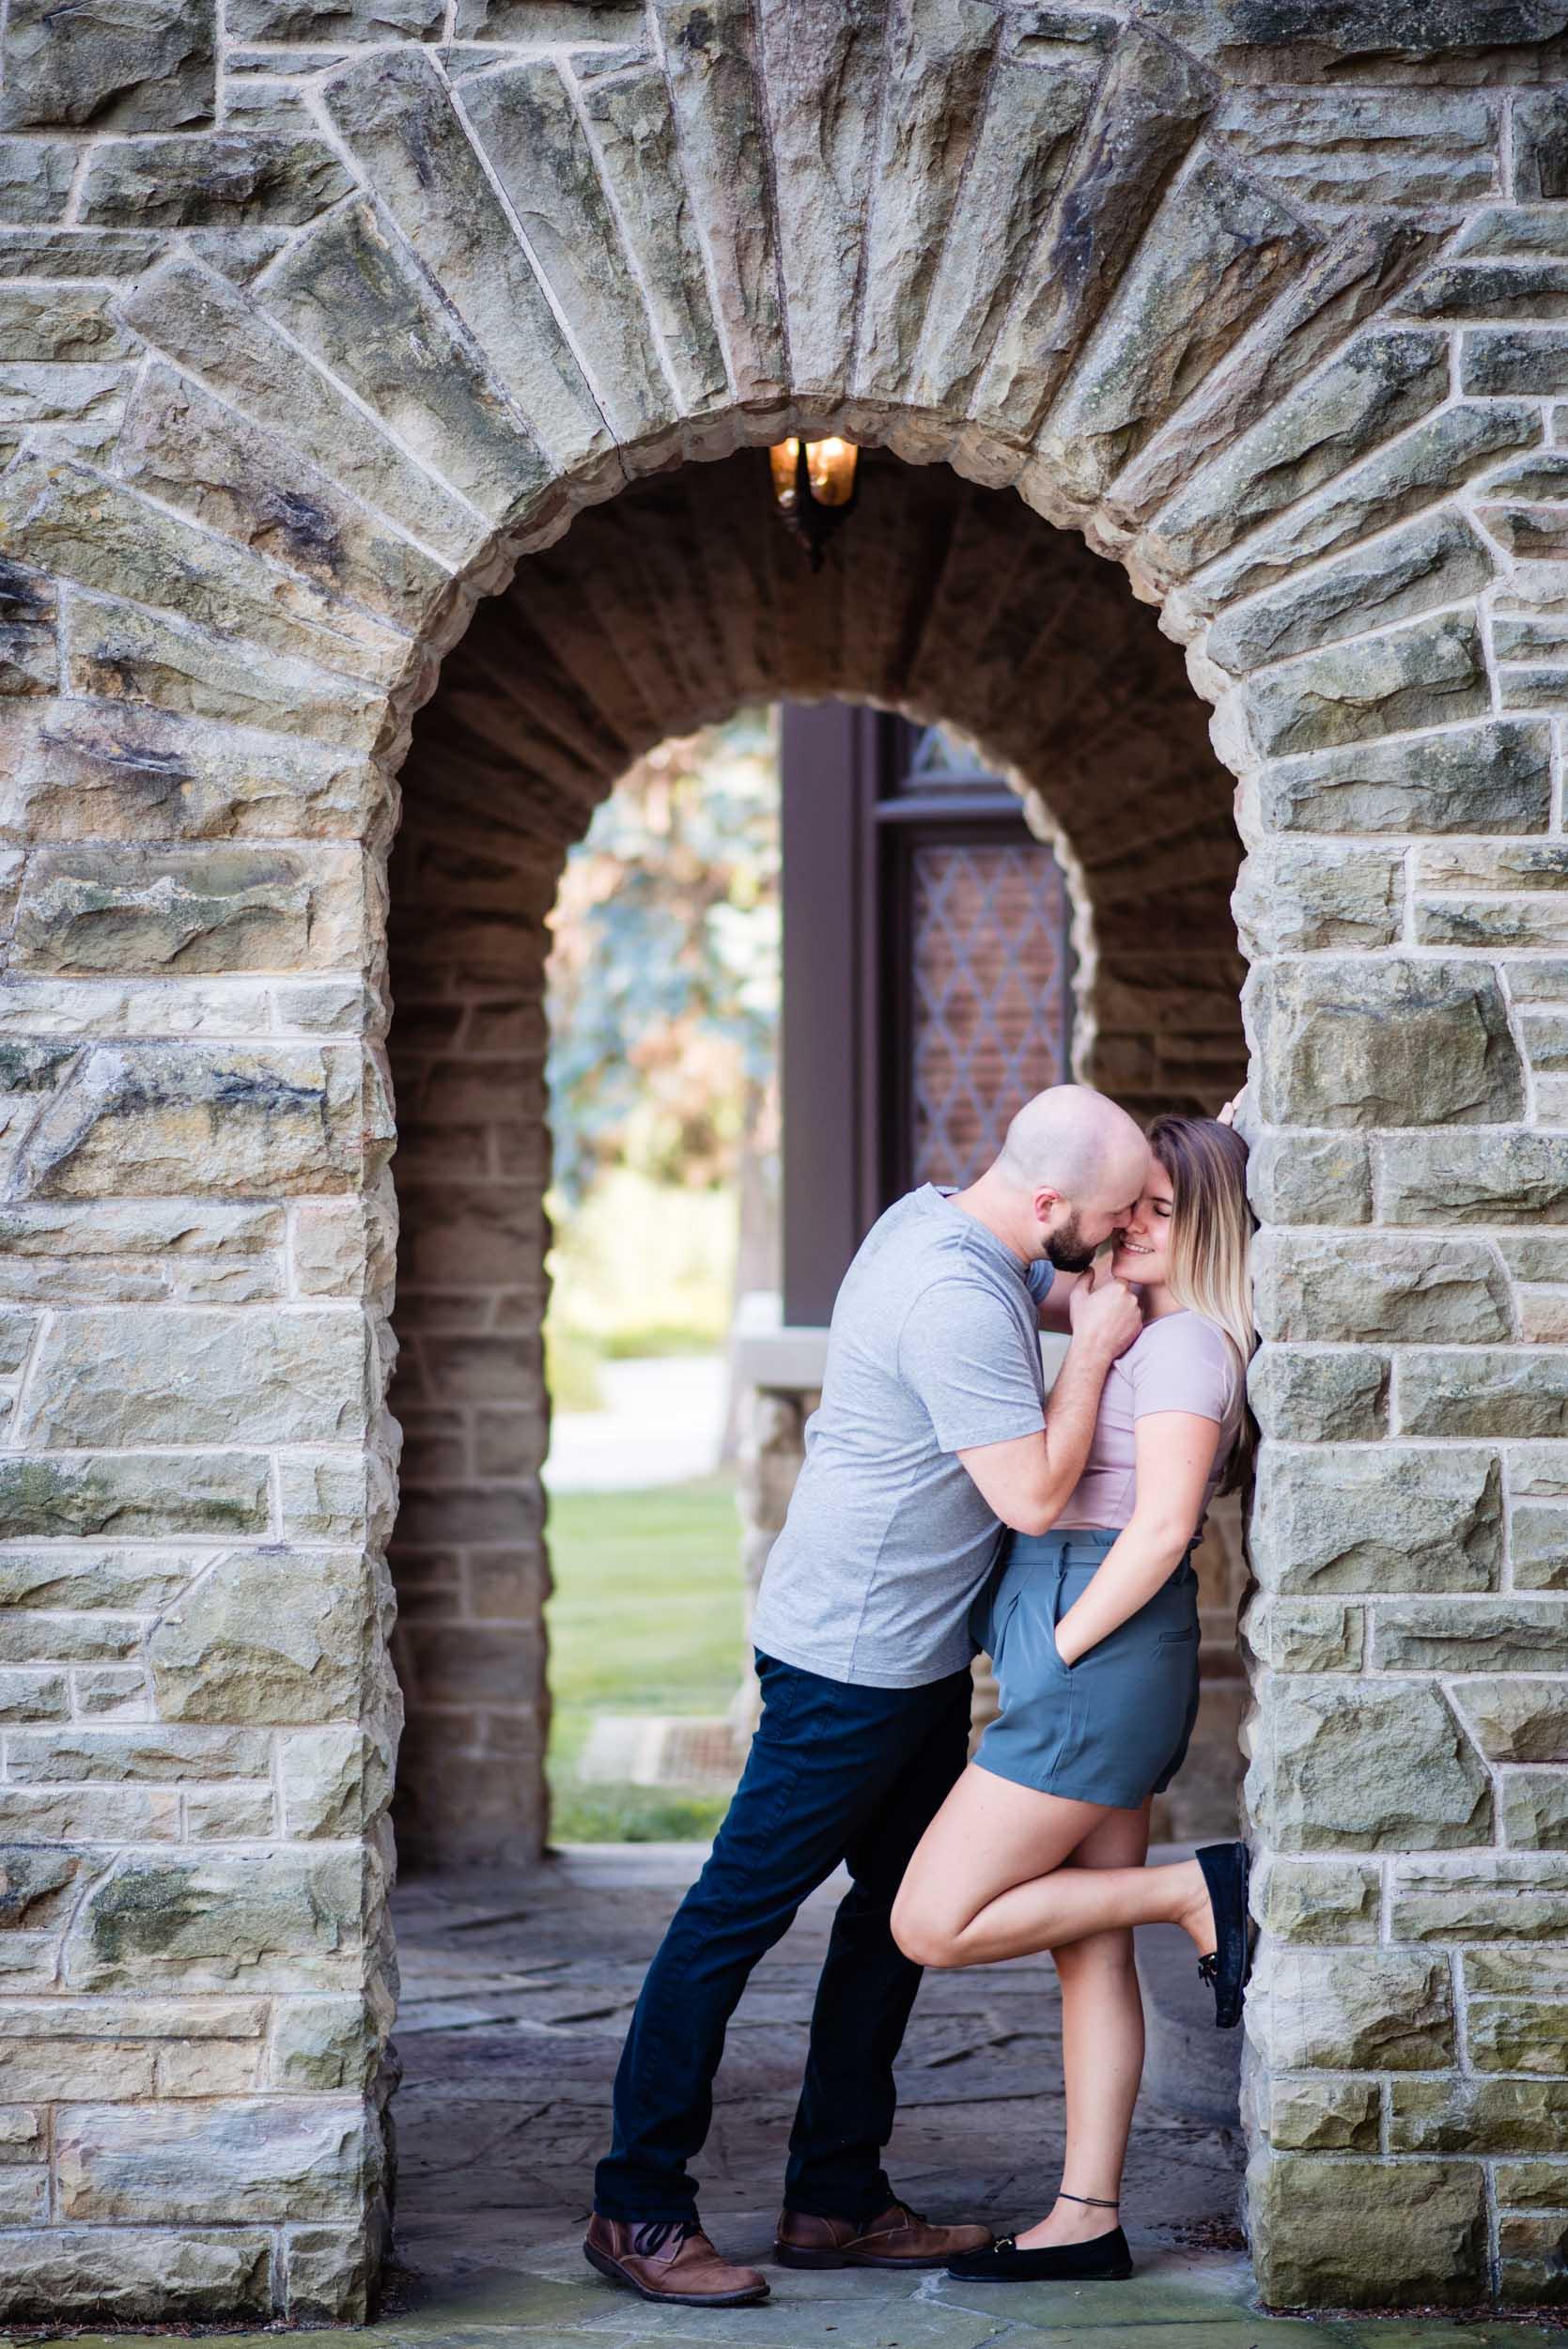 Engagement-Photography-King-College-London-Ontario (4).jpg